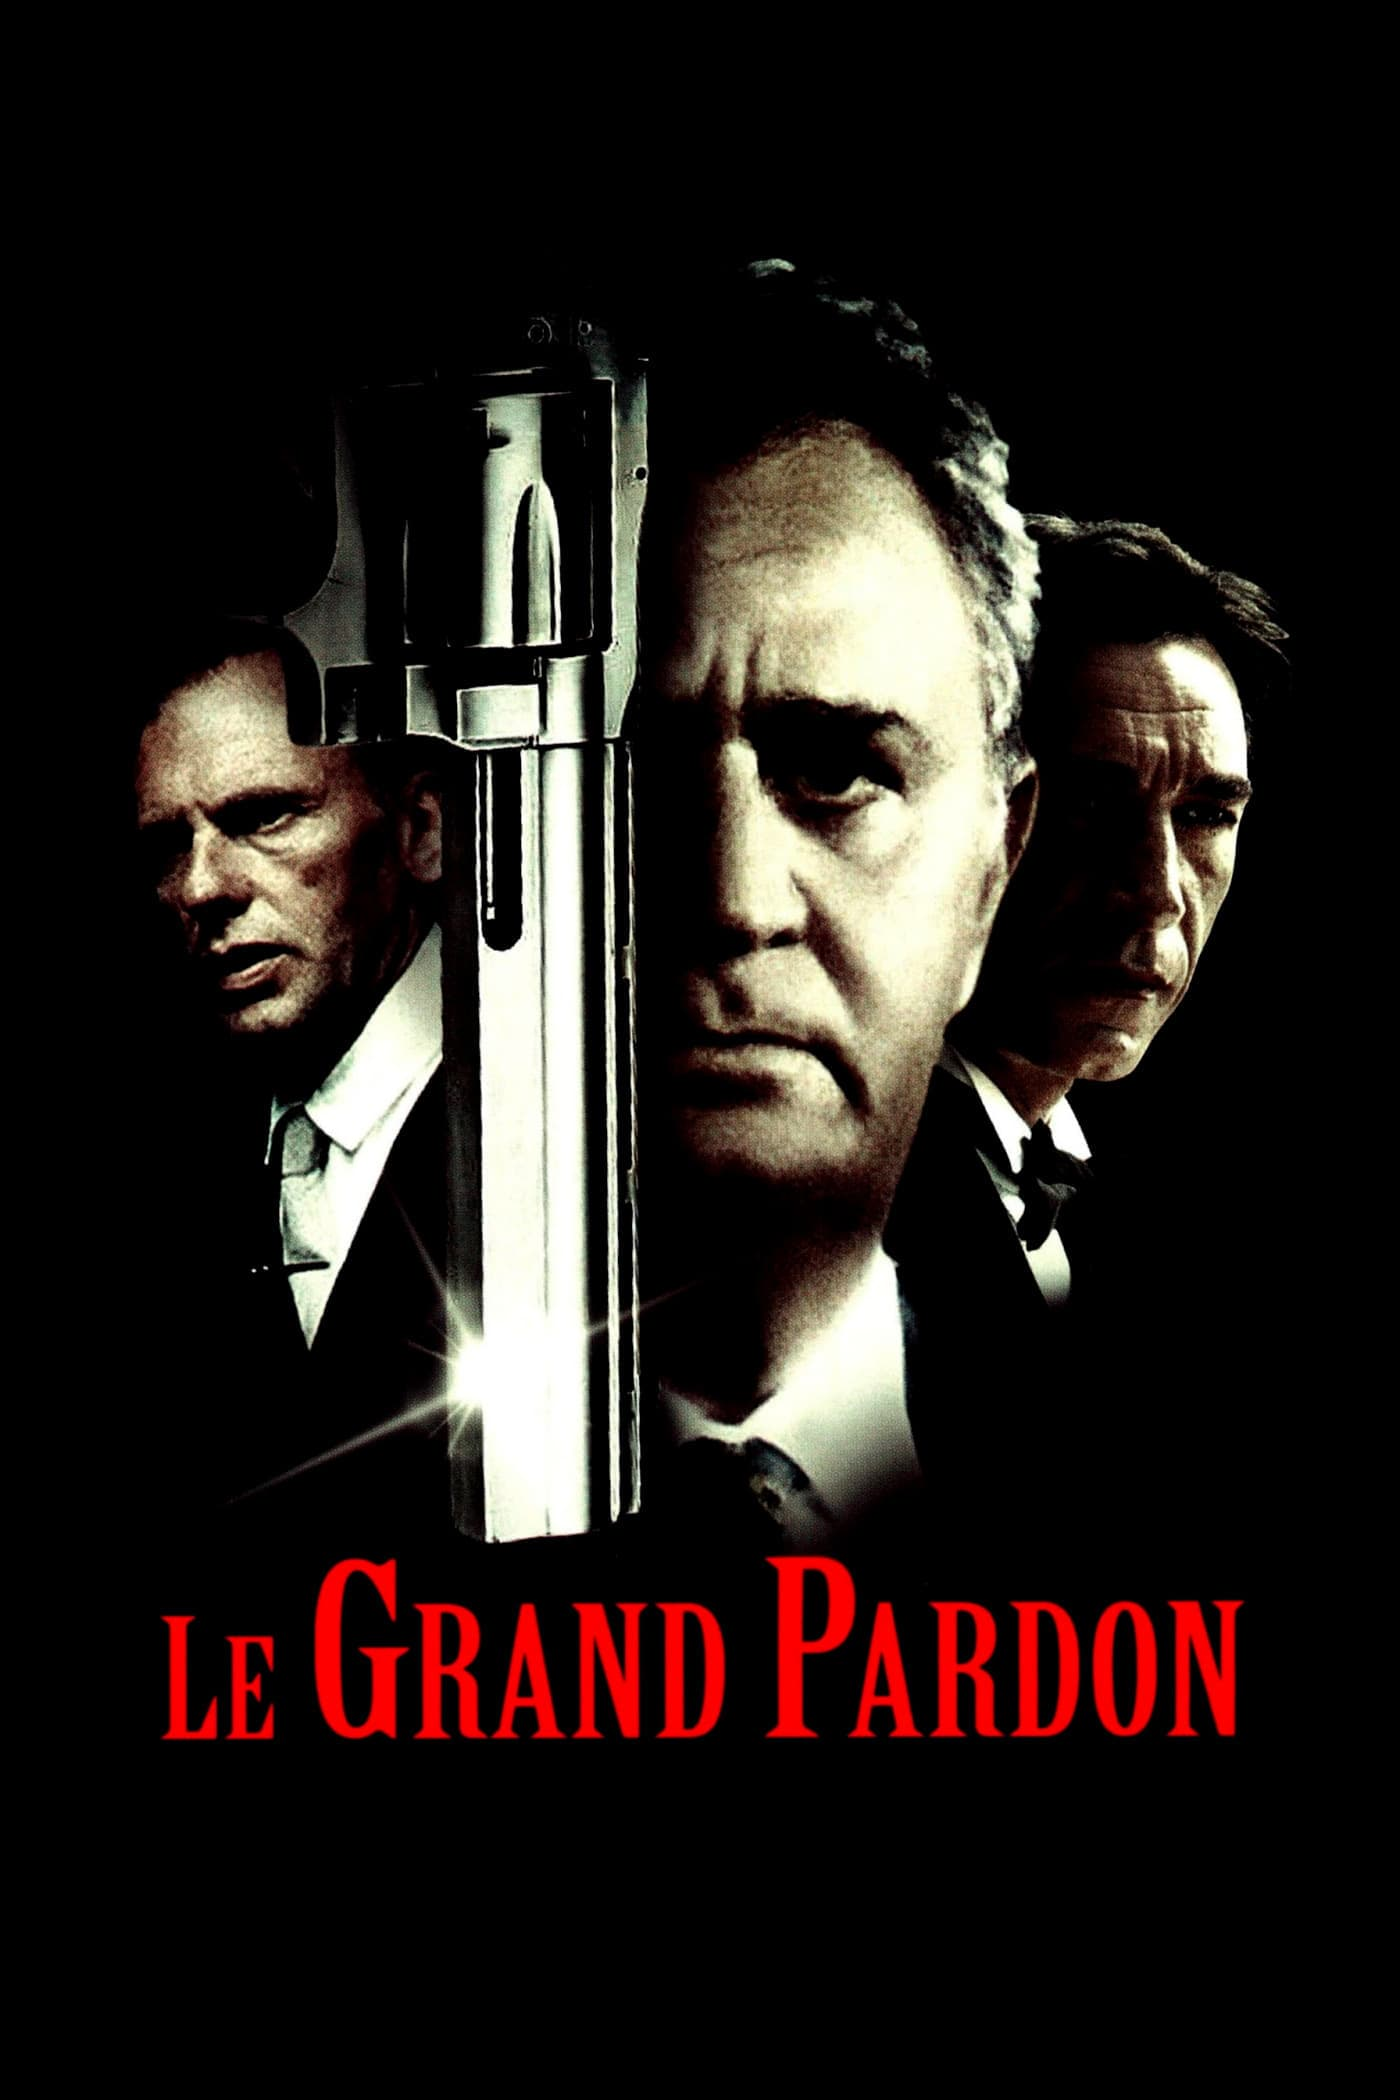 Le Grand Pardon Streaming : grand, pardon, streaming, Grand, Pardon, French, Movie, Streaming, Online, Watch